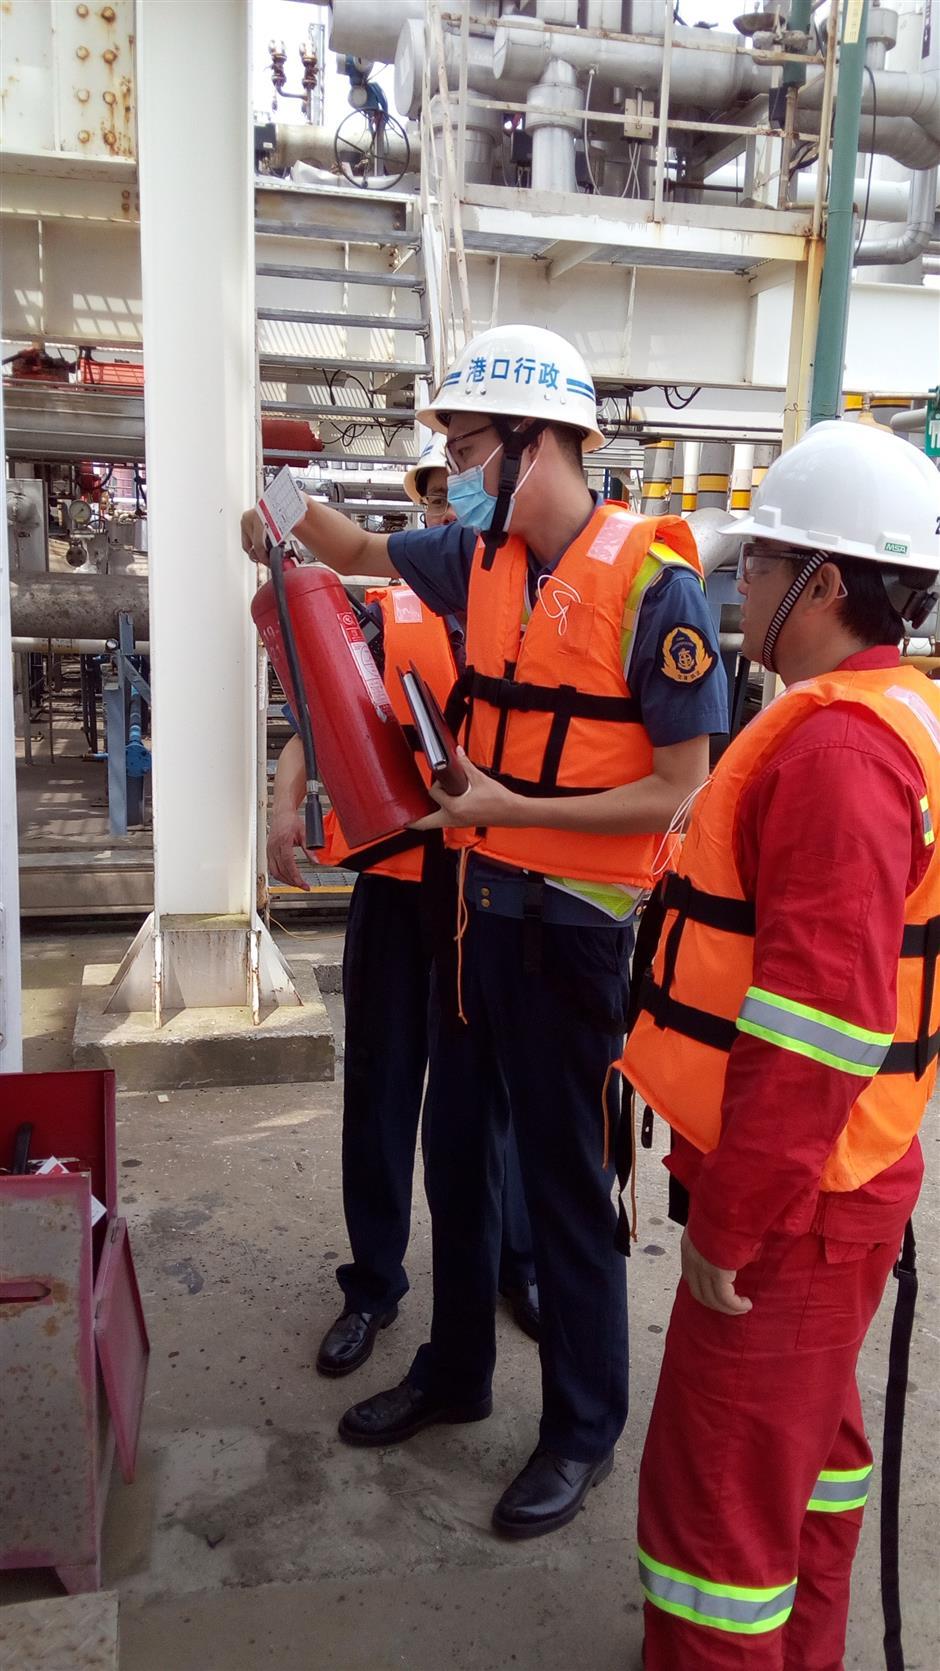 City begins inspection of dangerous goods at port